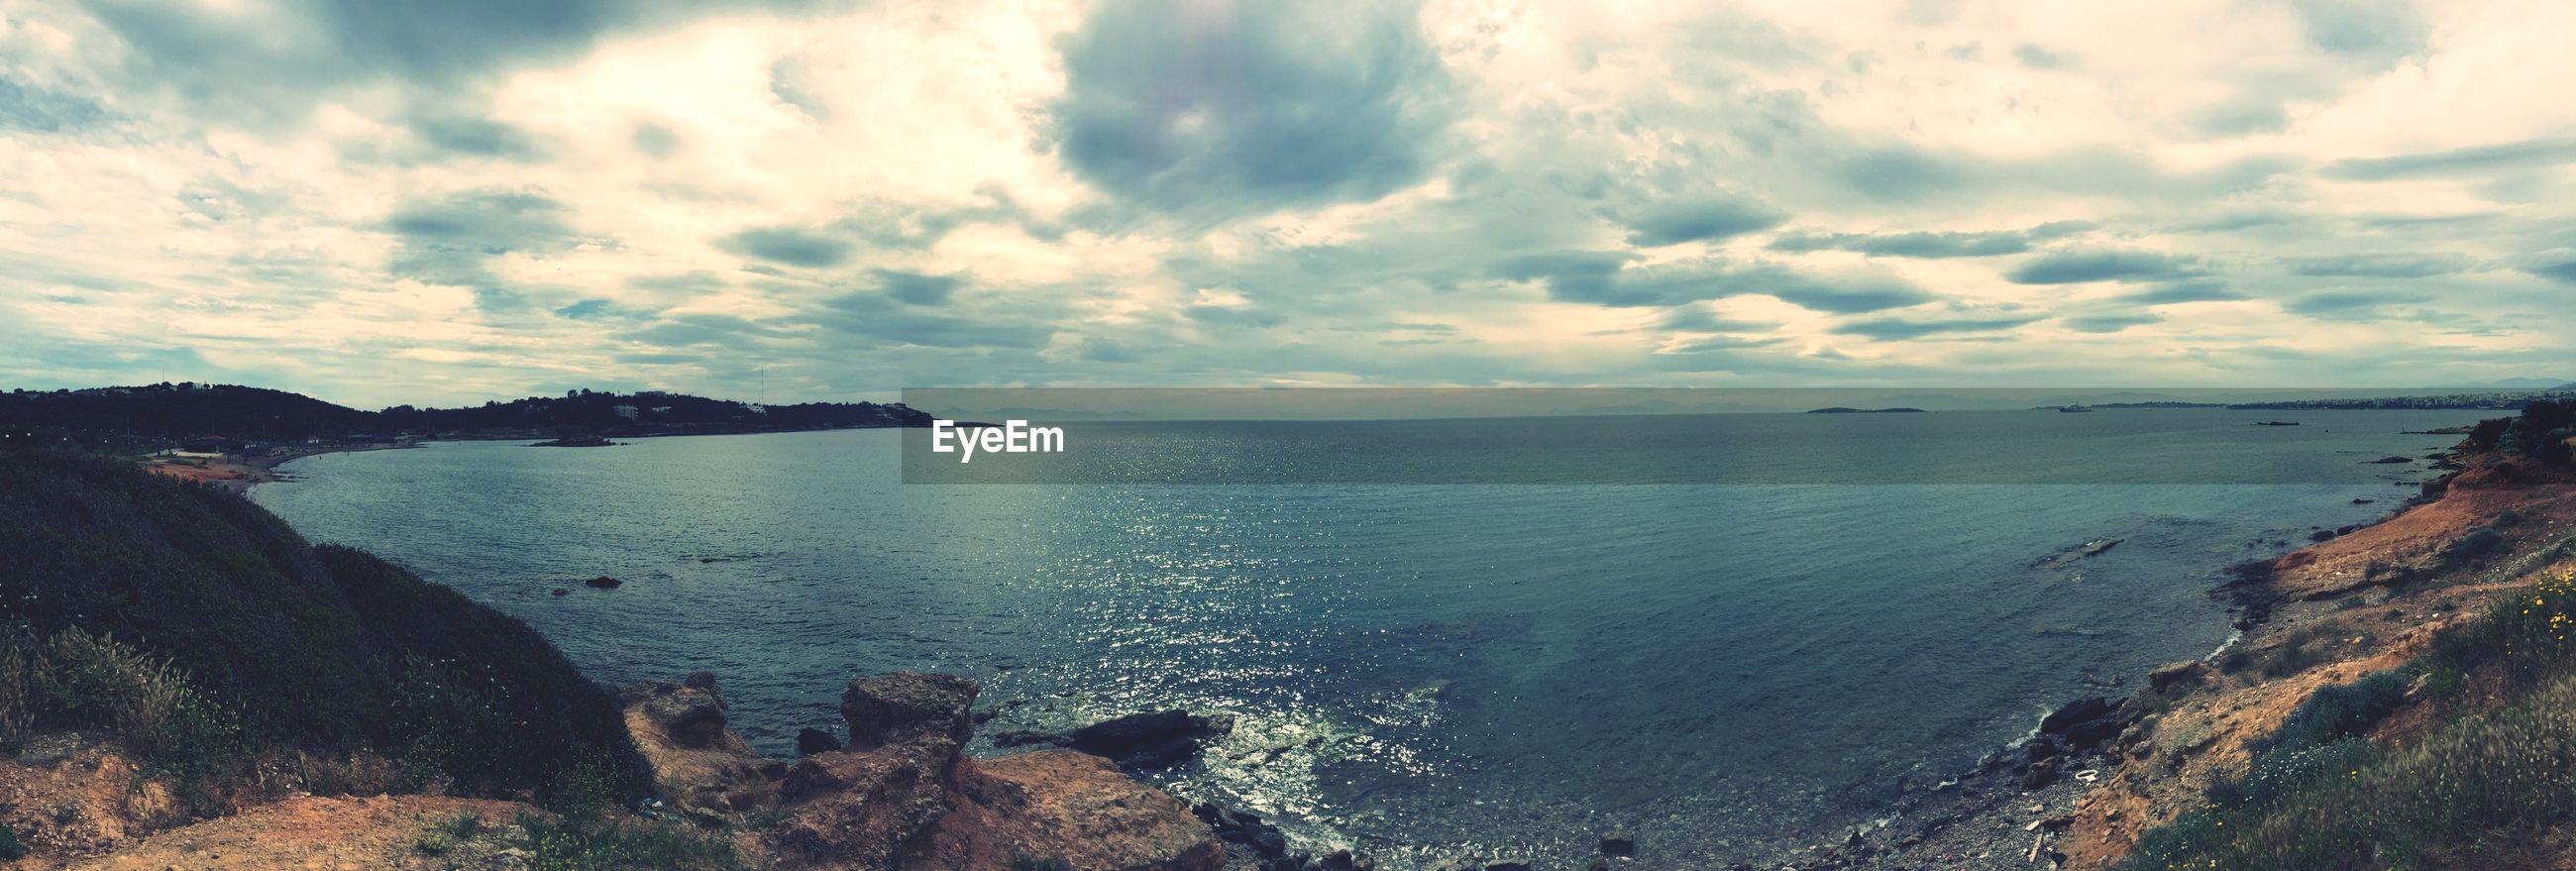 water, sea, sky, tranquil scene, horizon over water, tranquility, scenics, beauty in nature, cloud - sky, beach, shore, nature, cloudy, cloud, idyllic, reflection, coastline, calm, outdoors, non-urban scene